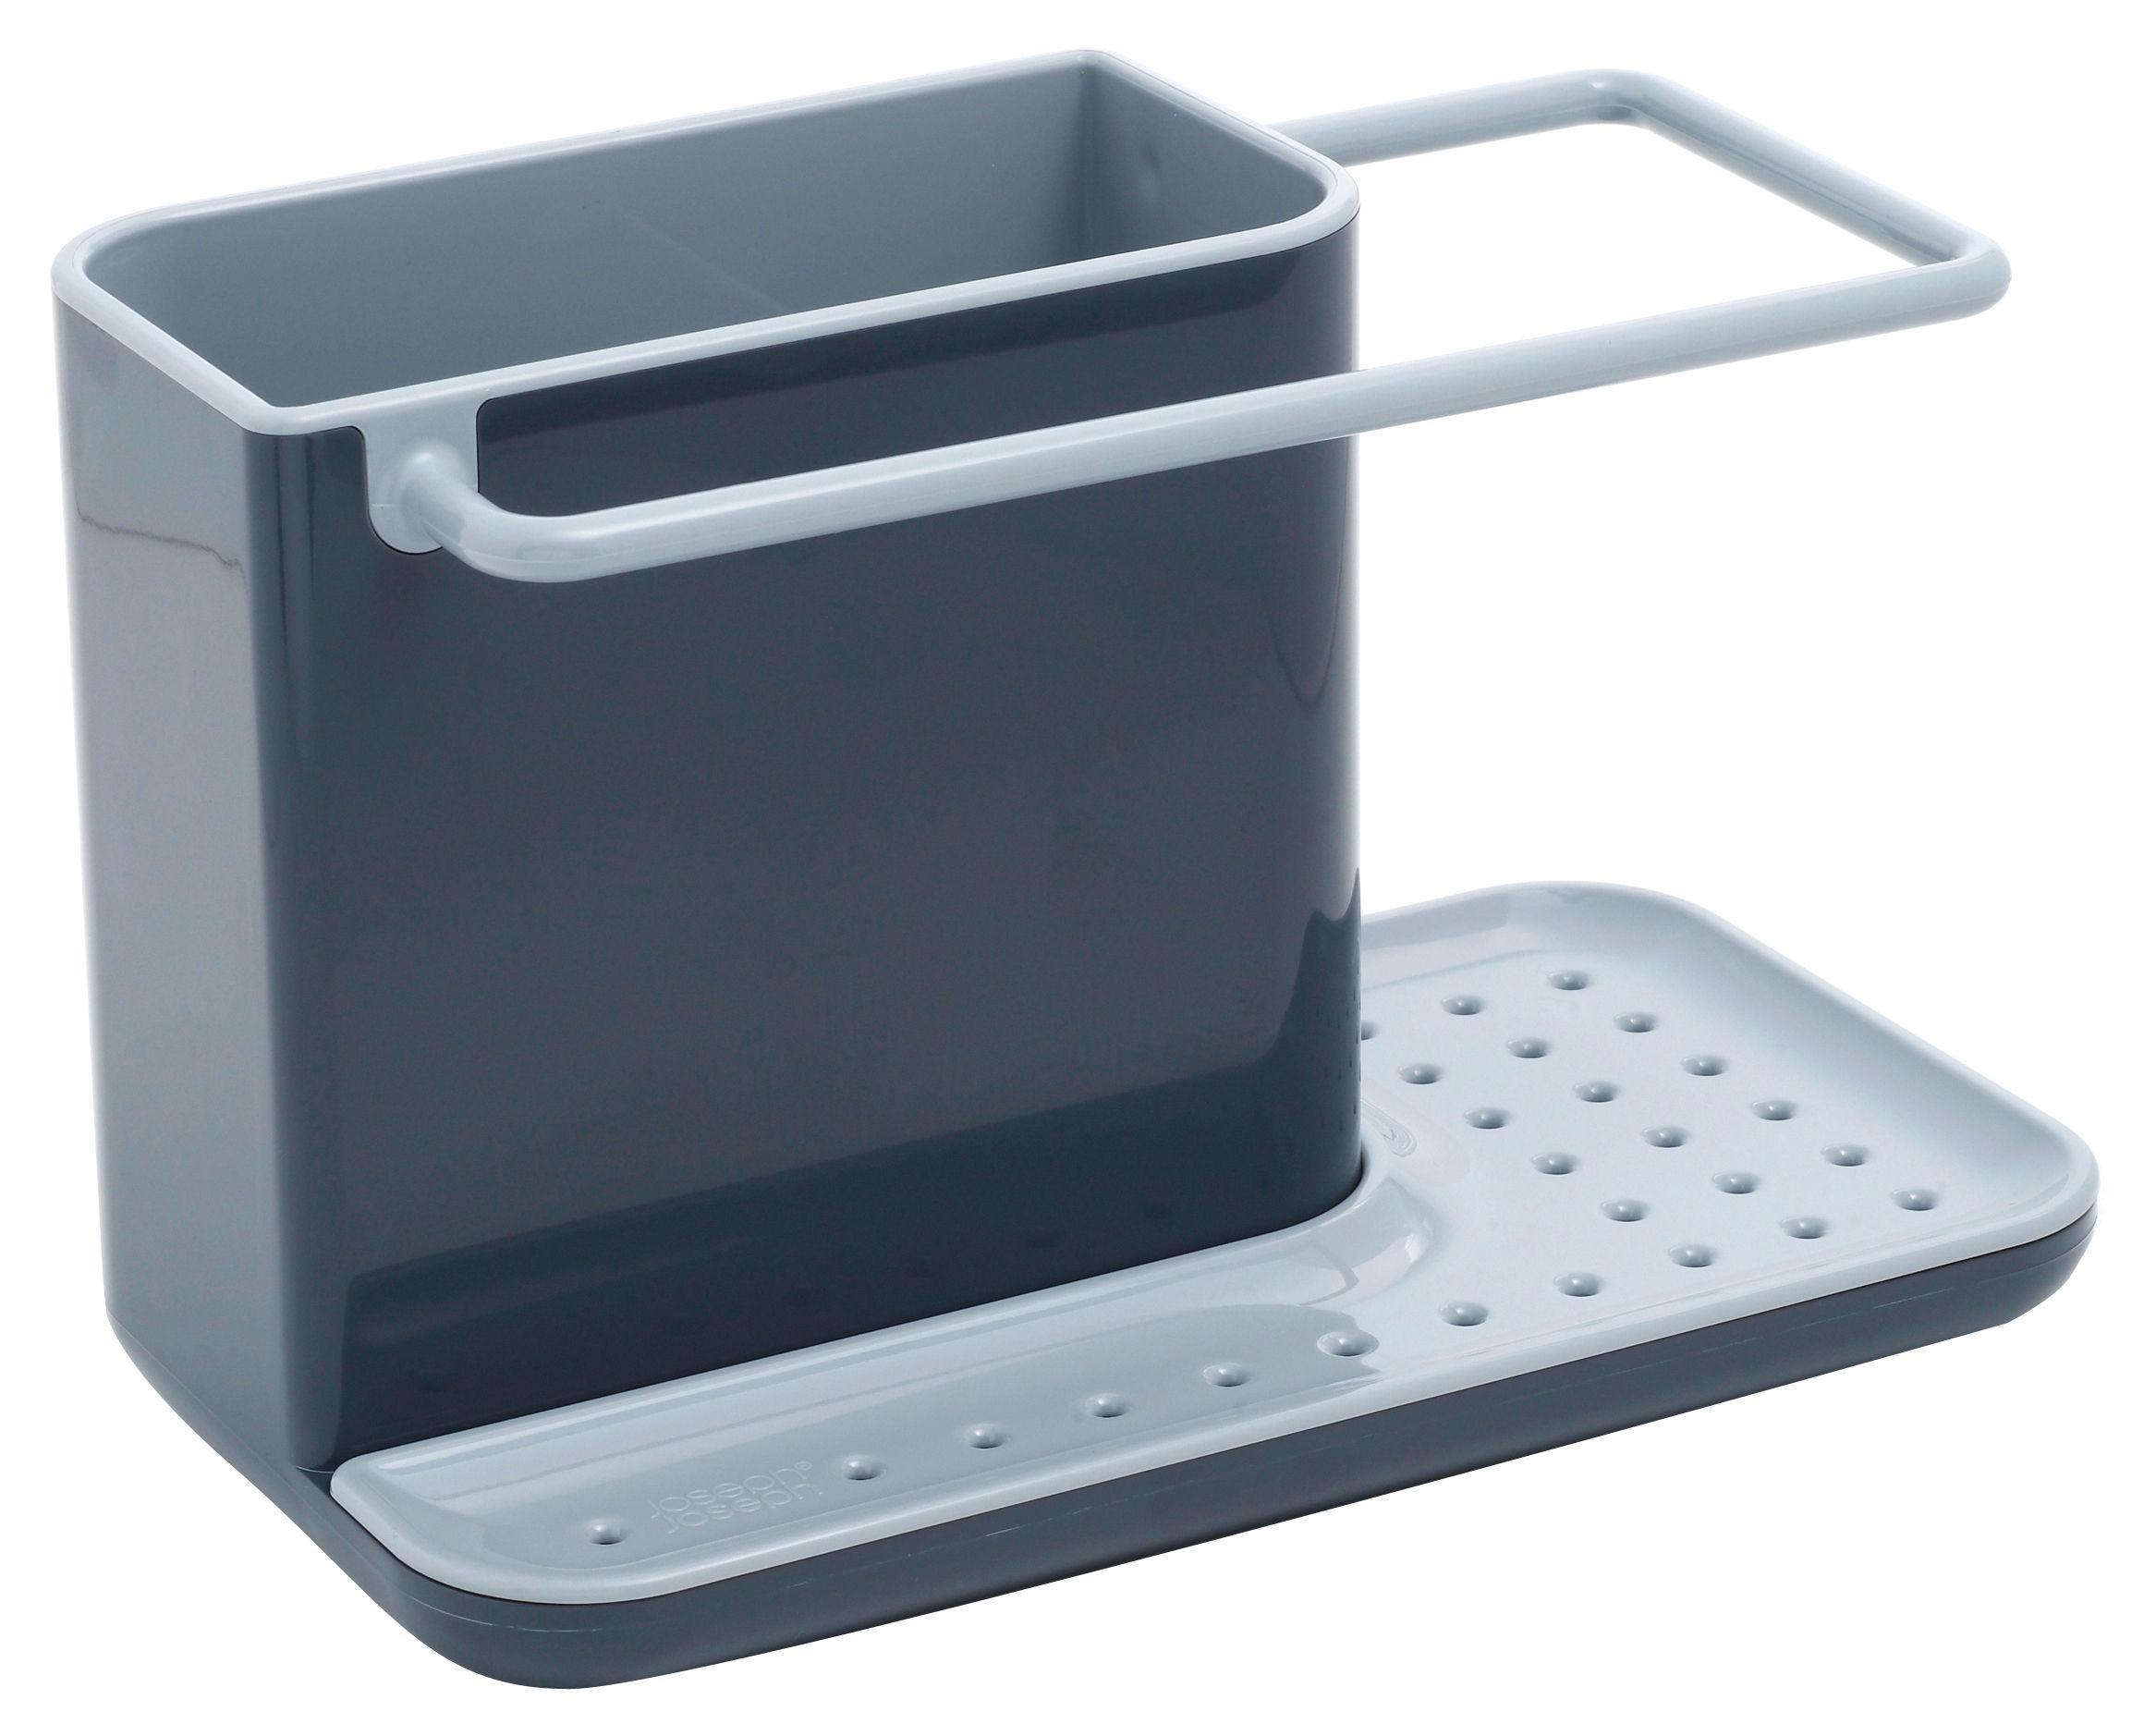 caddy utensilienhalter f r das sp lbecken joseph joseph. Black Bedroom Furniture Sets. Home Design Ideas